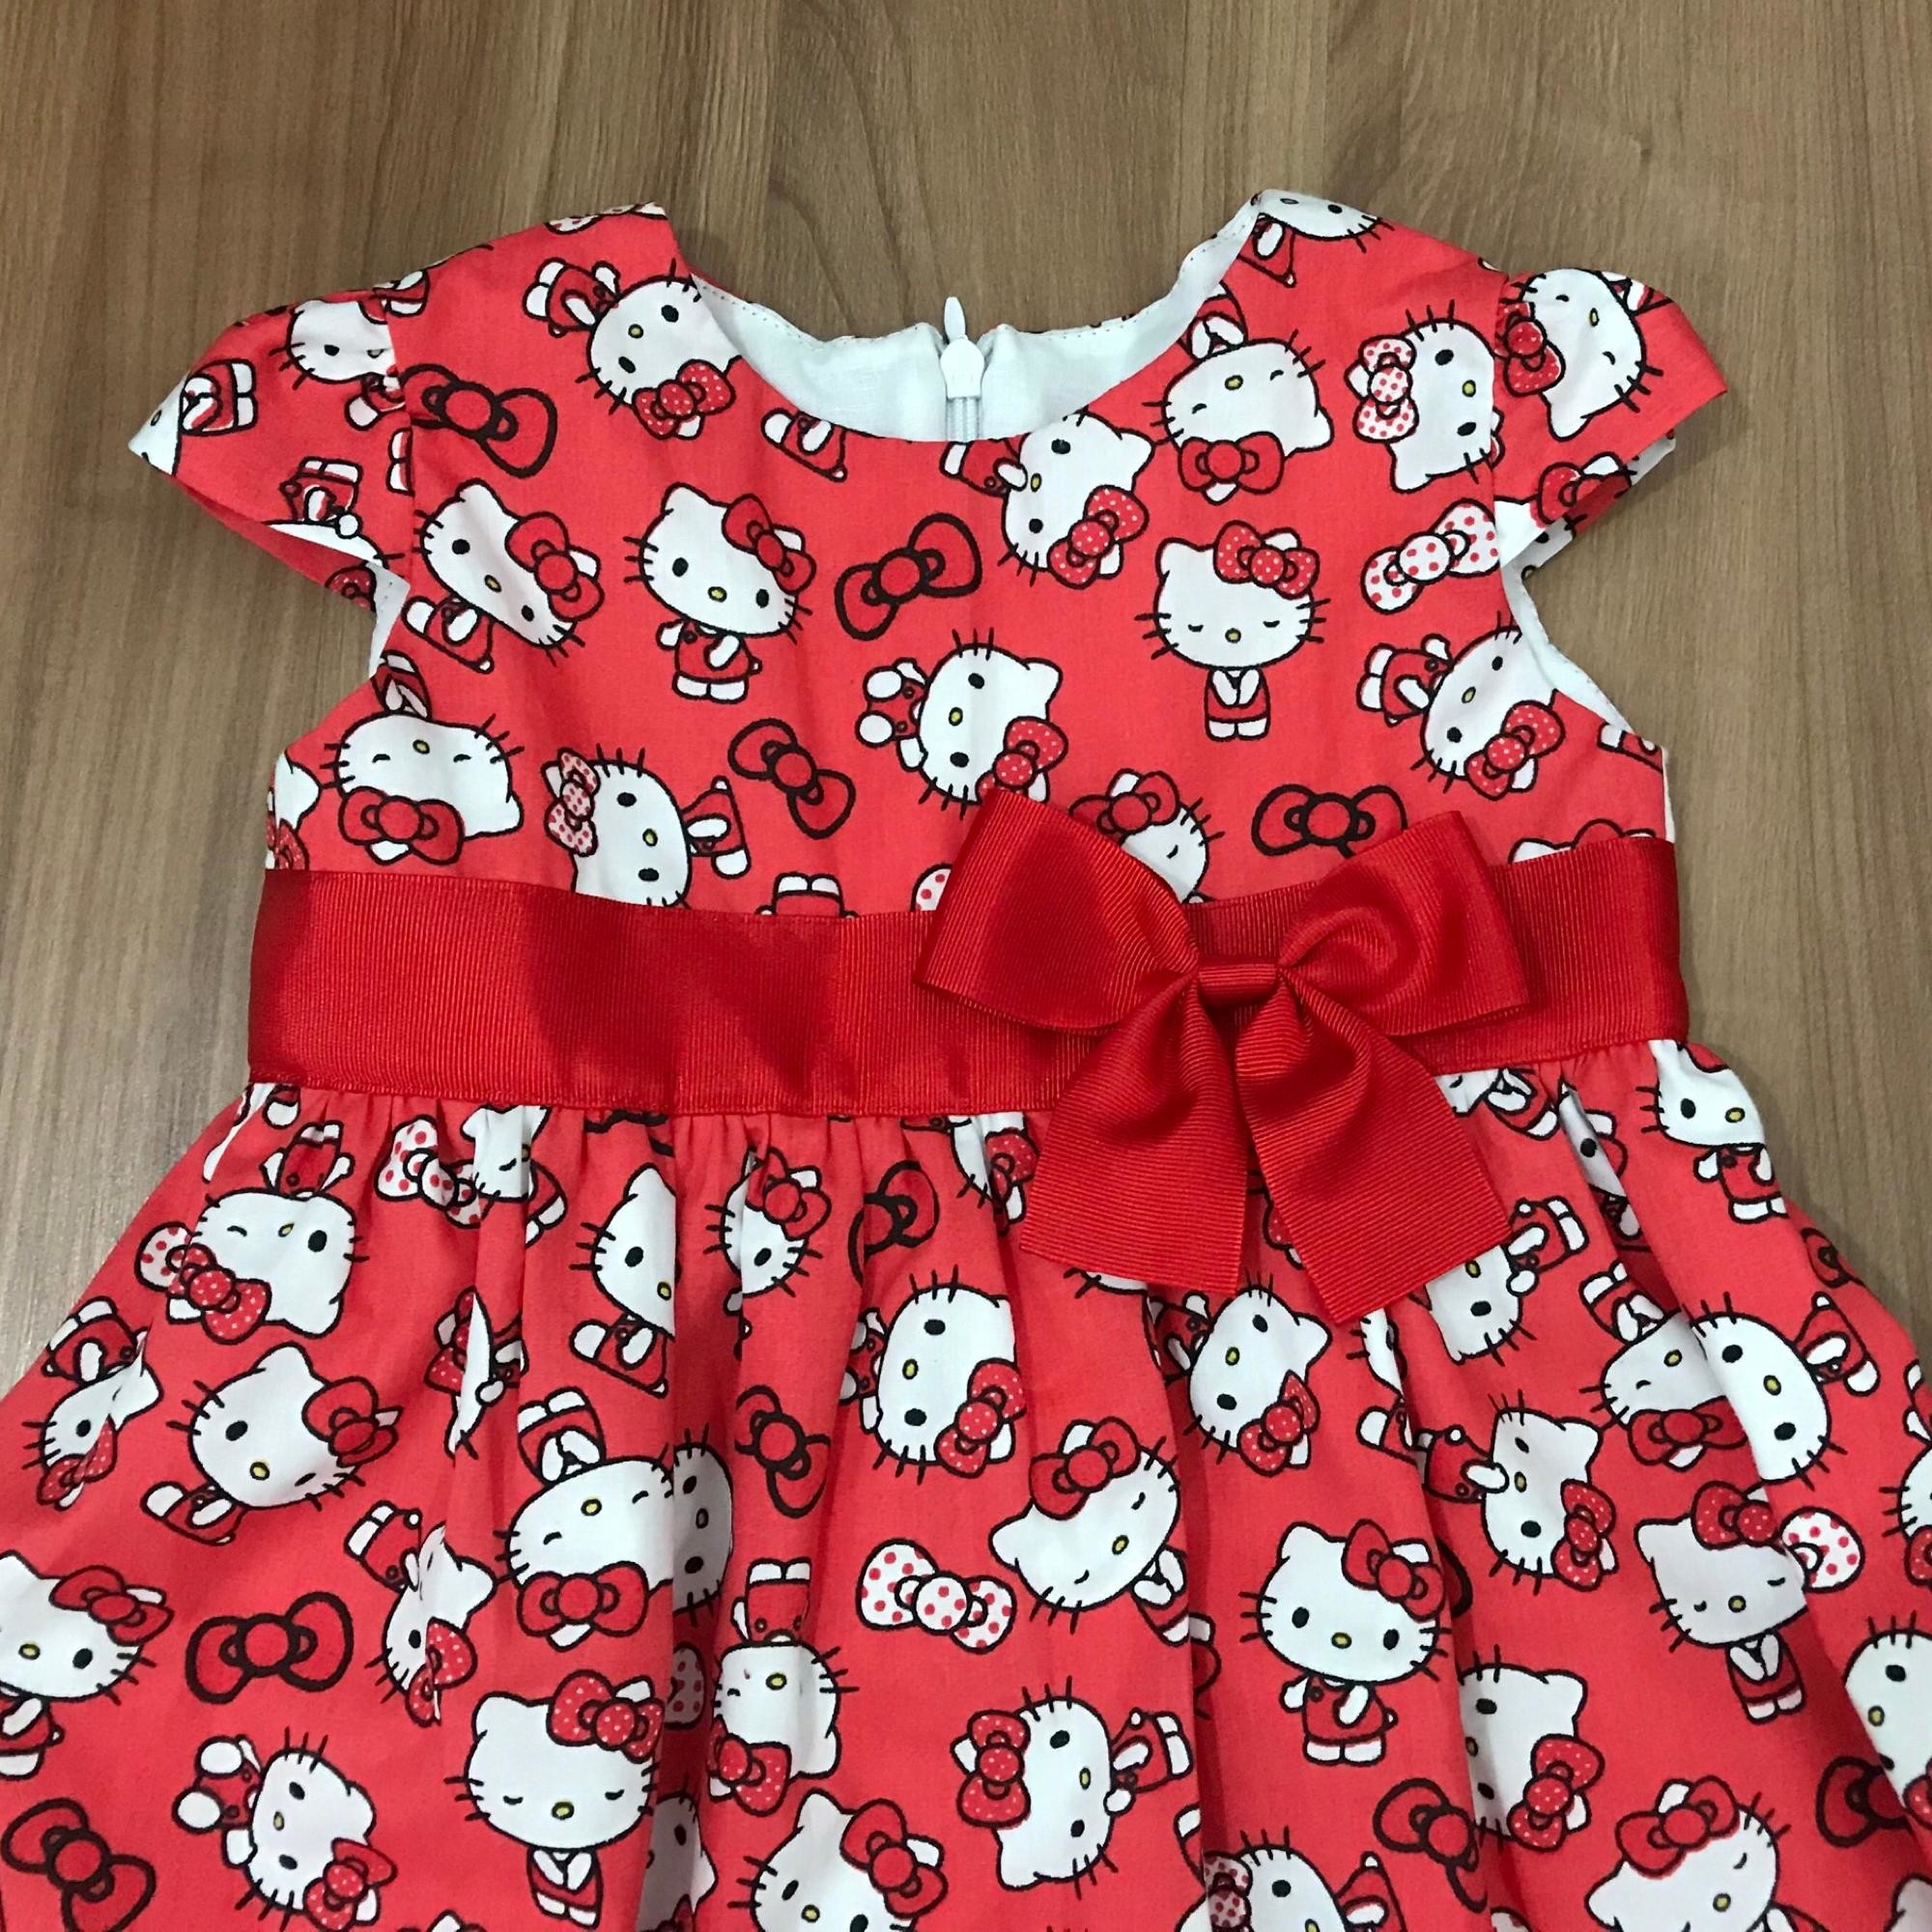 Vestido infantil Hello kitty vermelho no Elo7  5605fae5cc8